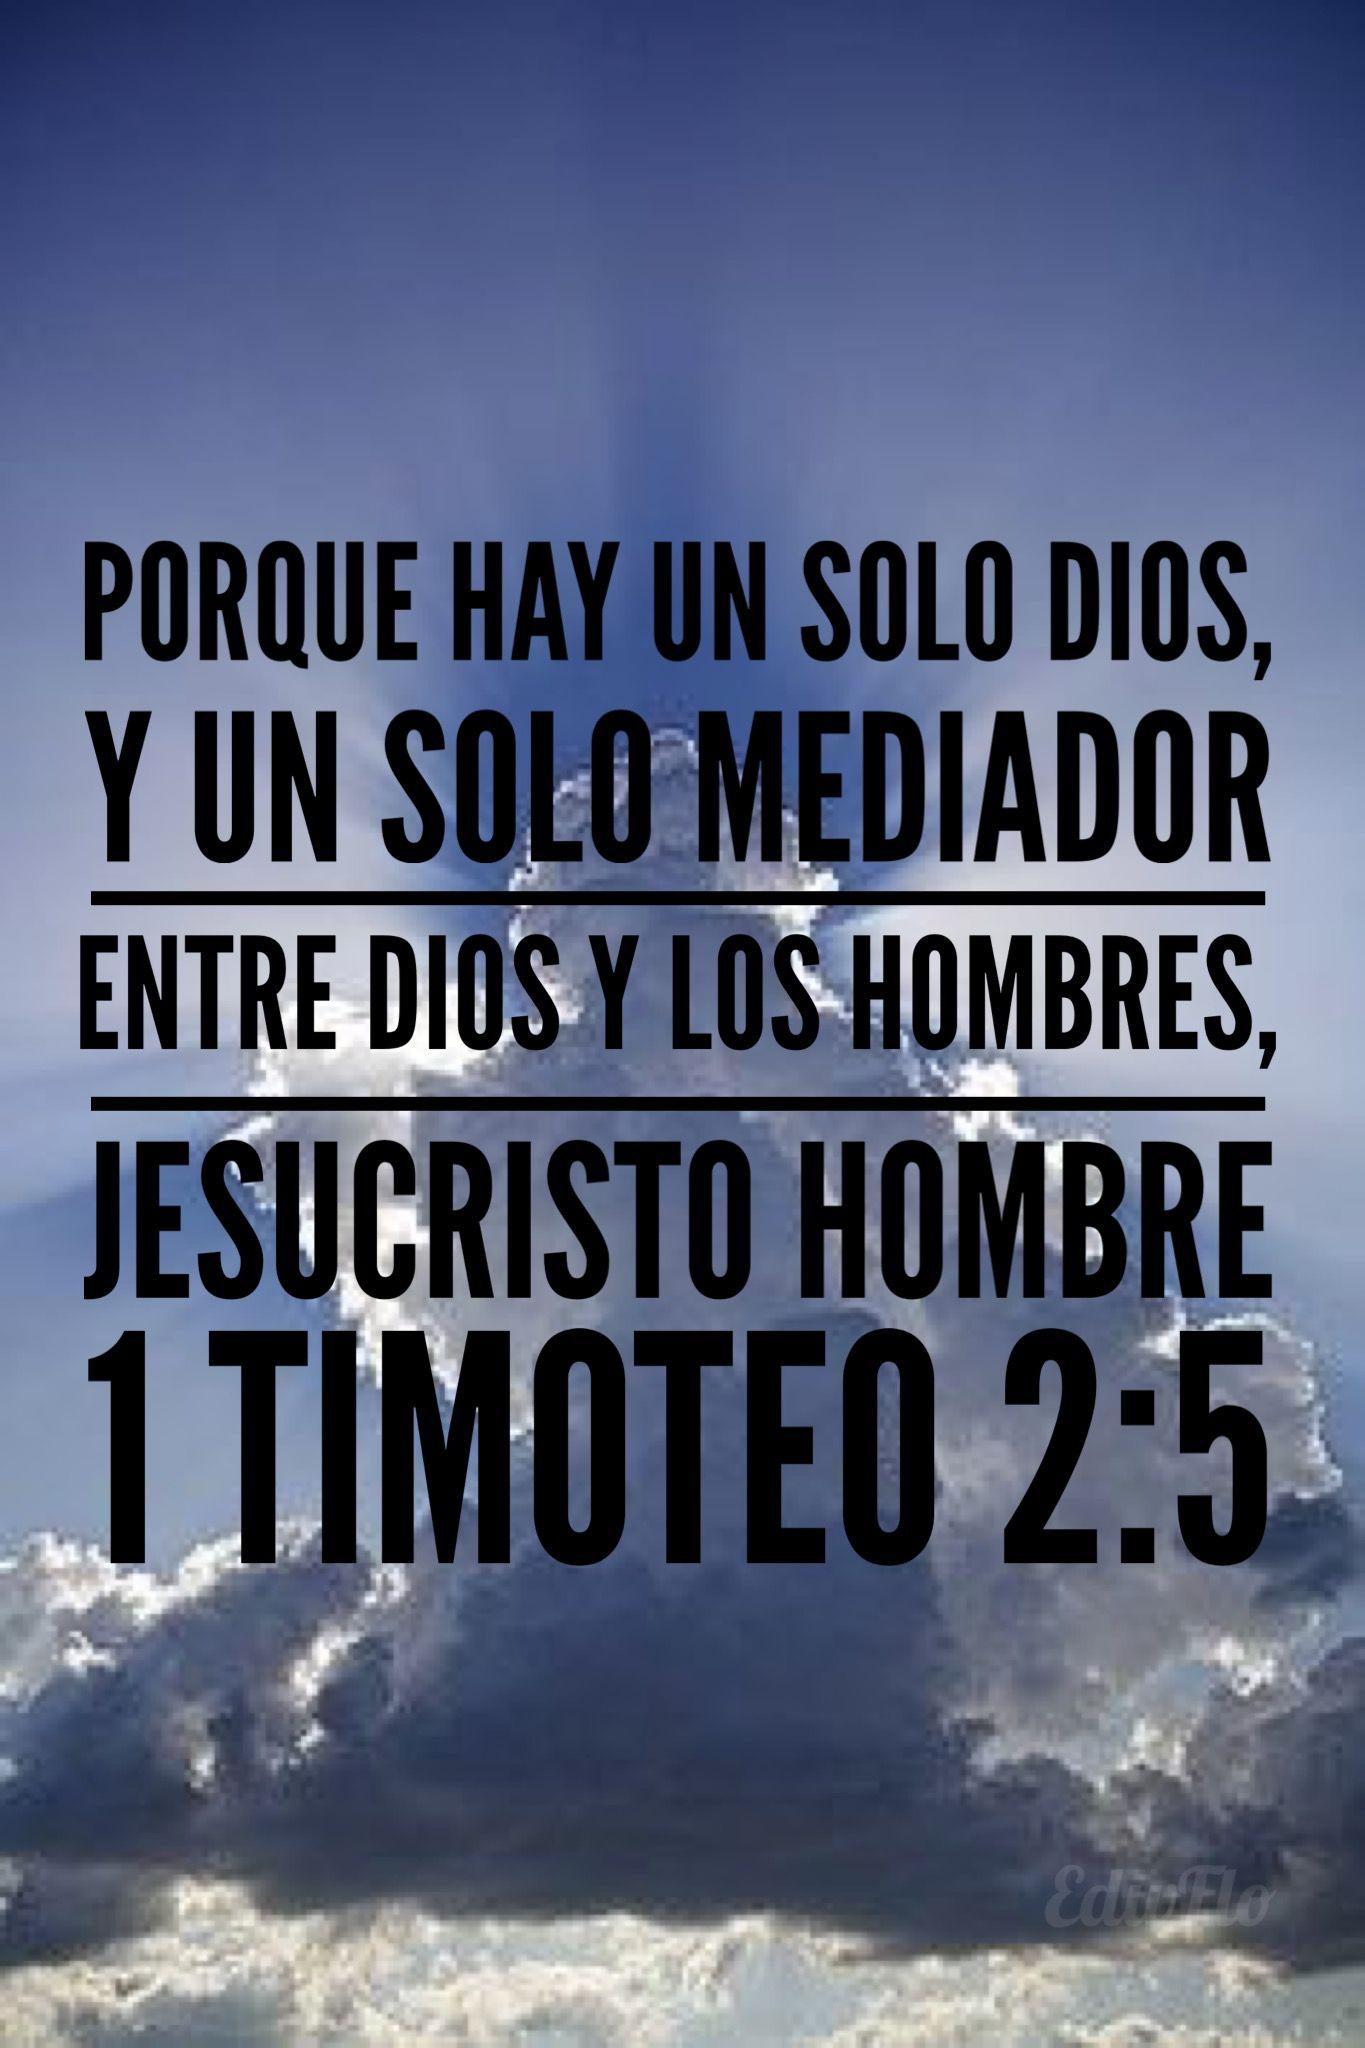 1 Timoteo 2:5 | Versículos de la biblia, Biblia cristiana, Biblia